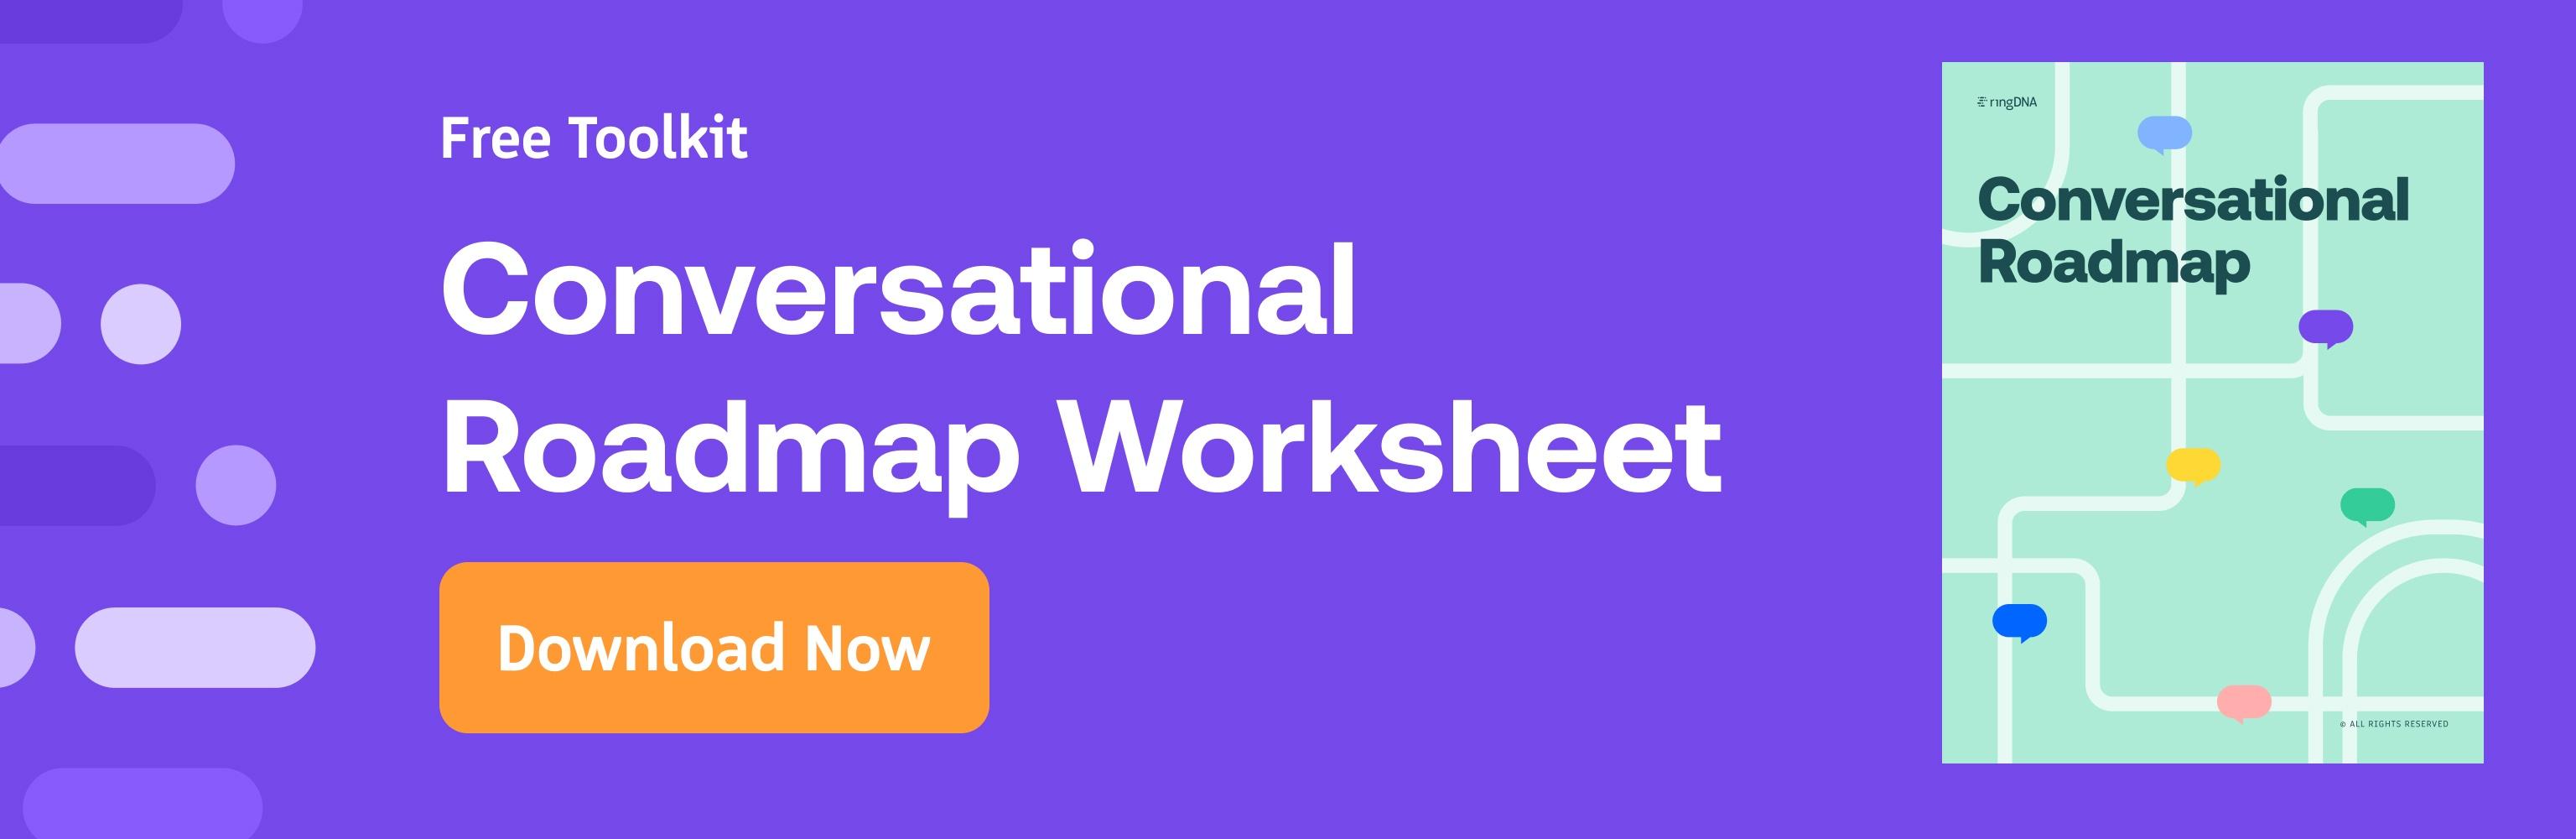 Conversational Roadmap Worksheet